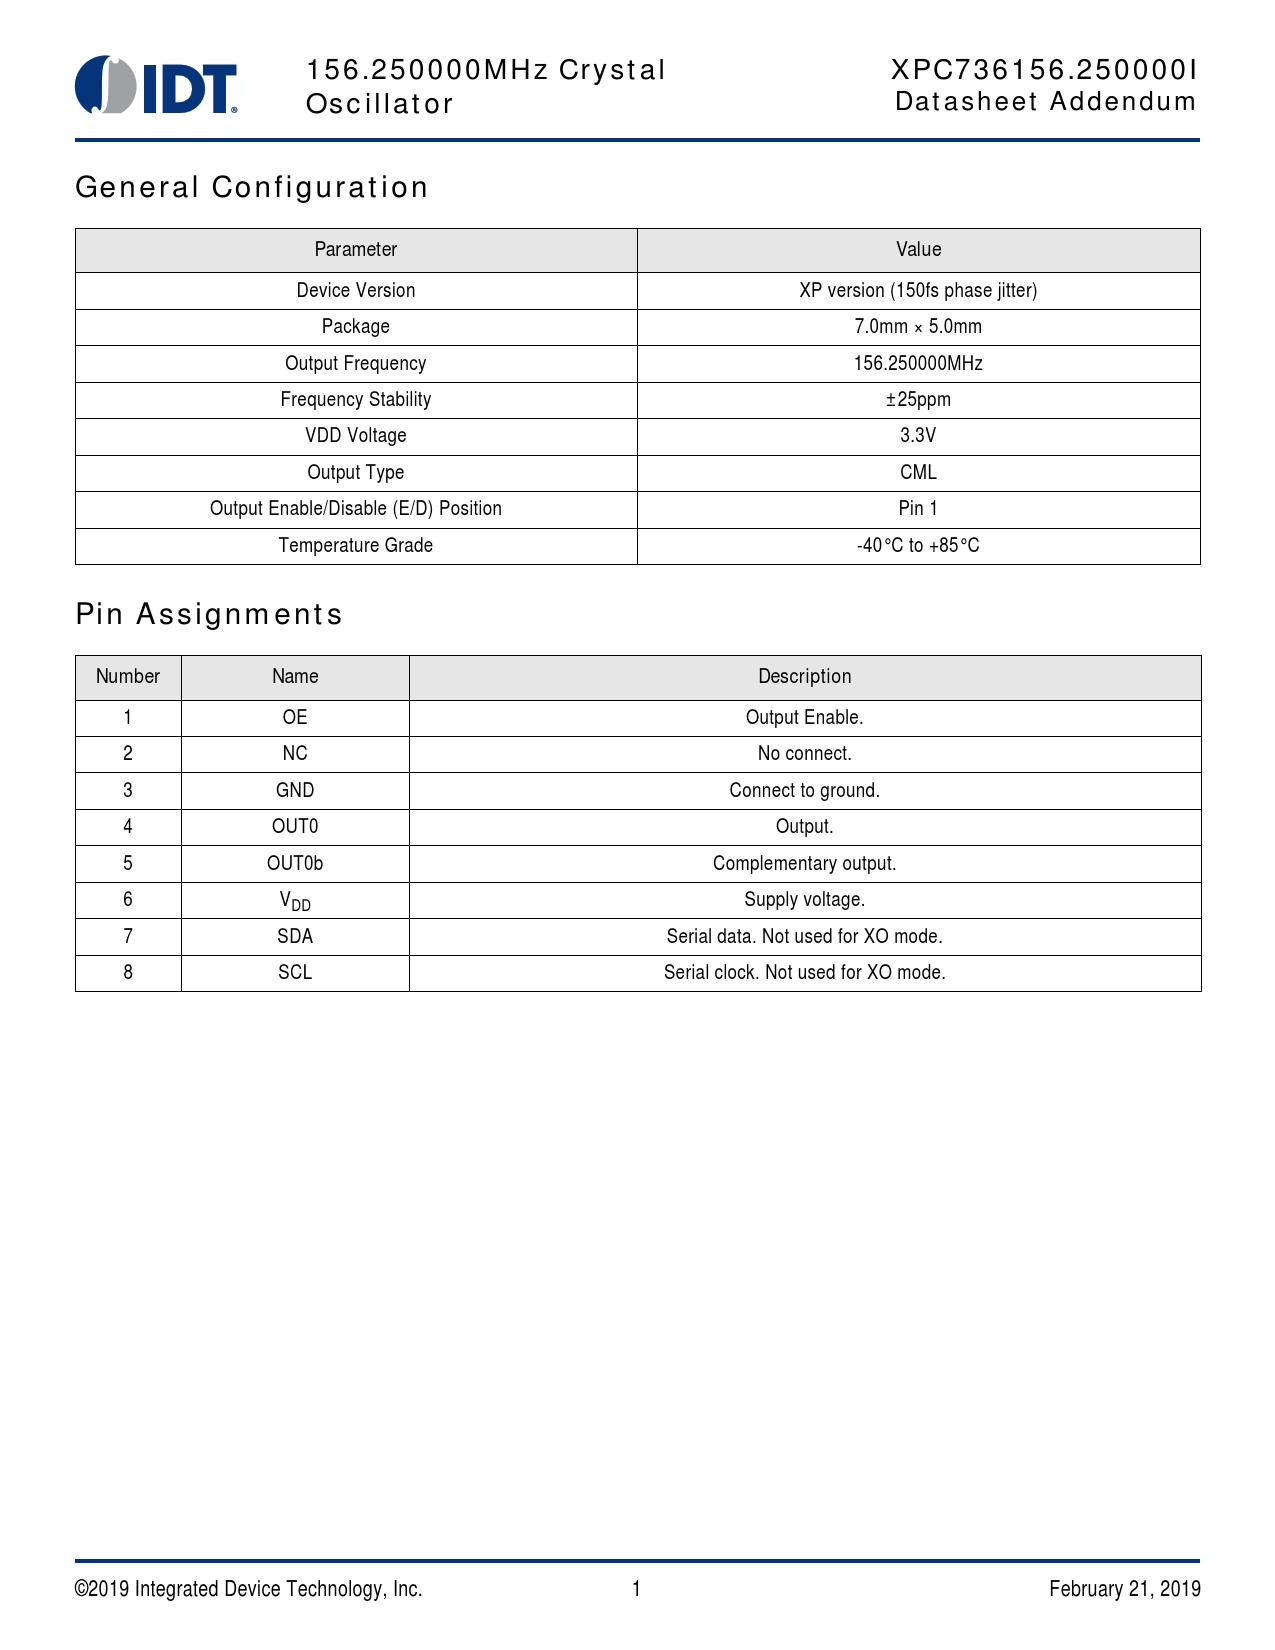 Datasheet Addendum XPC736156.250000I IDT, Revision: 20190221